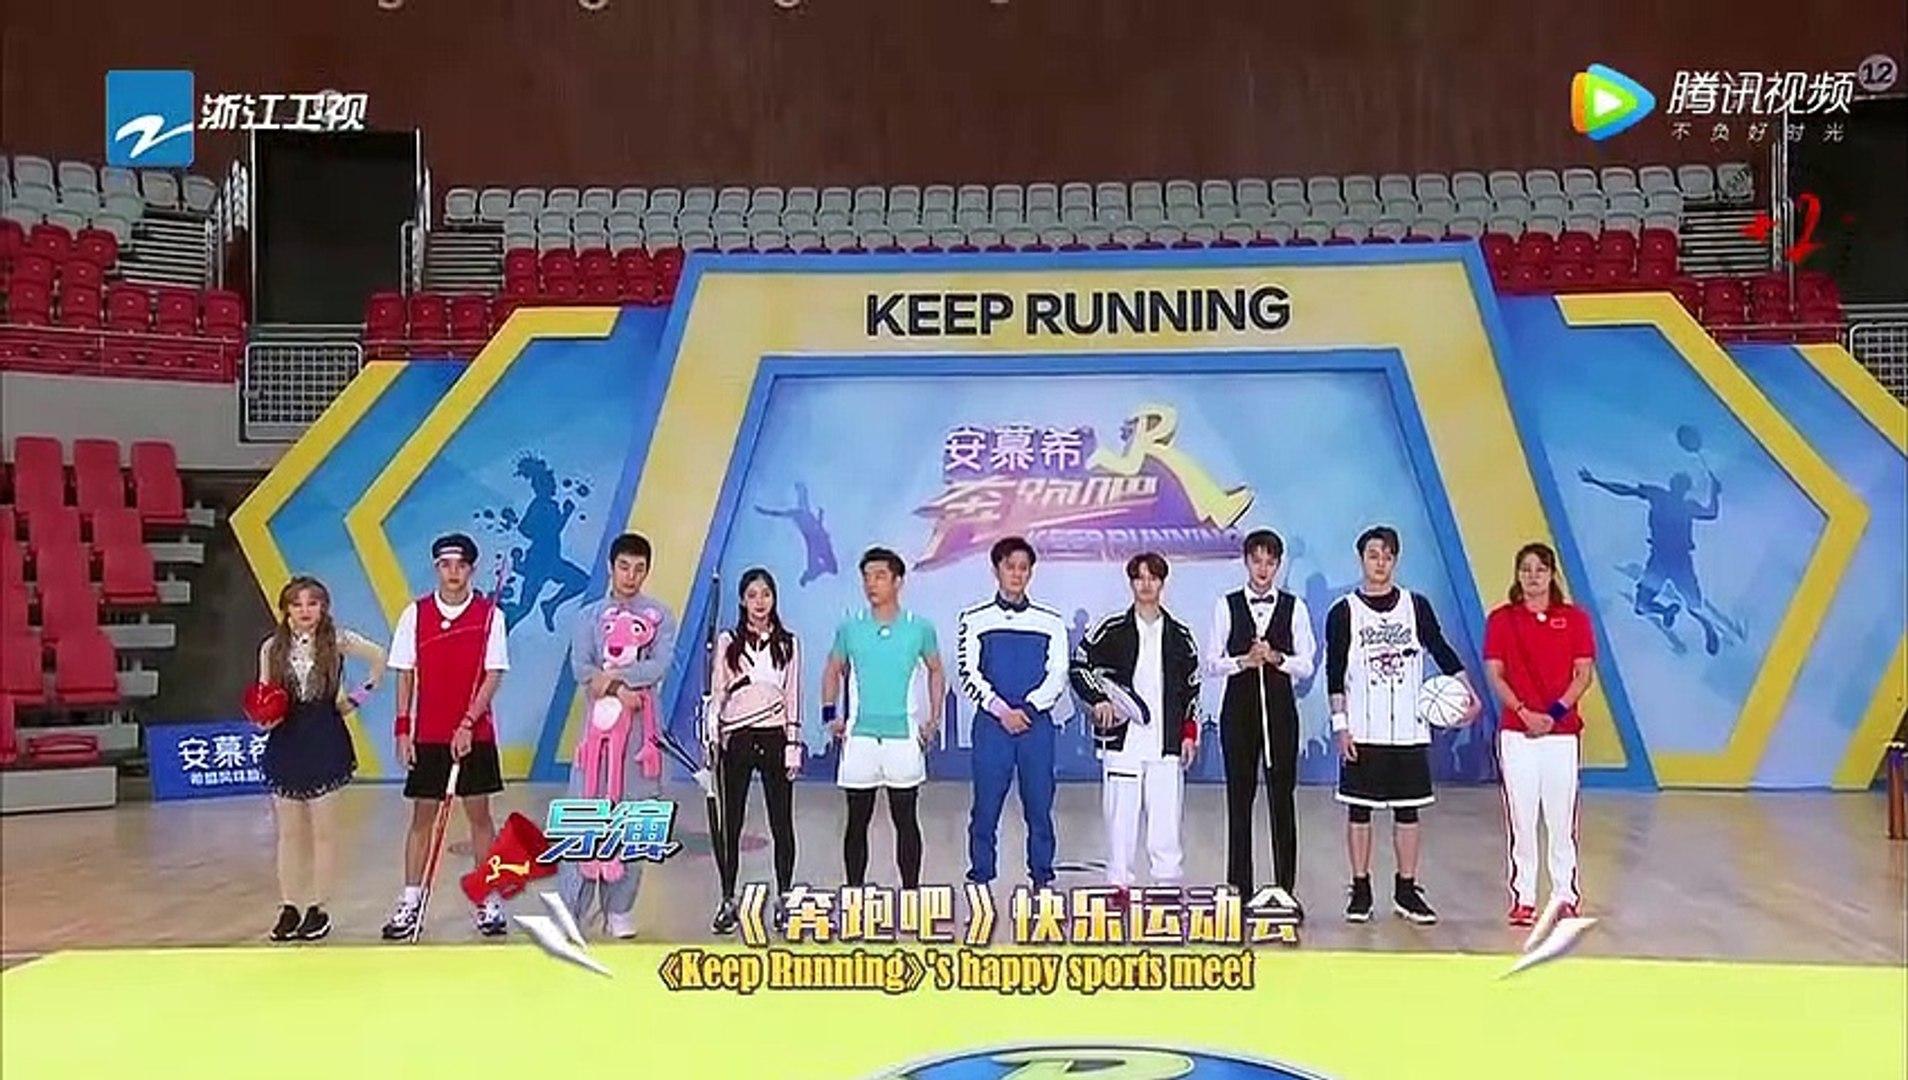 [EngSub] 190531 Keep Running 奔跑吧3 S3 EP6 Part 1/2 Jackson Wang 王嘉尔